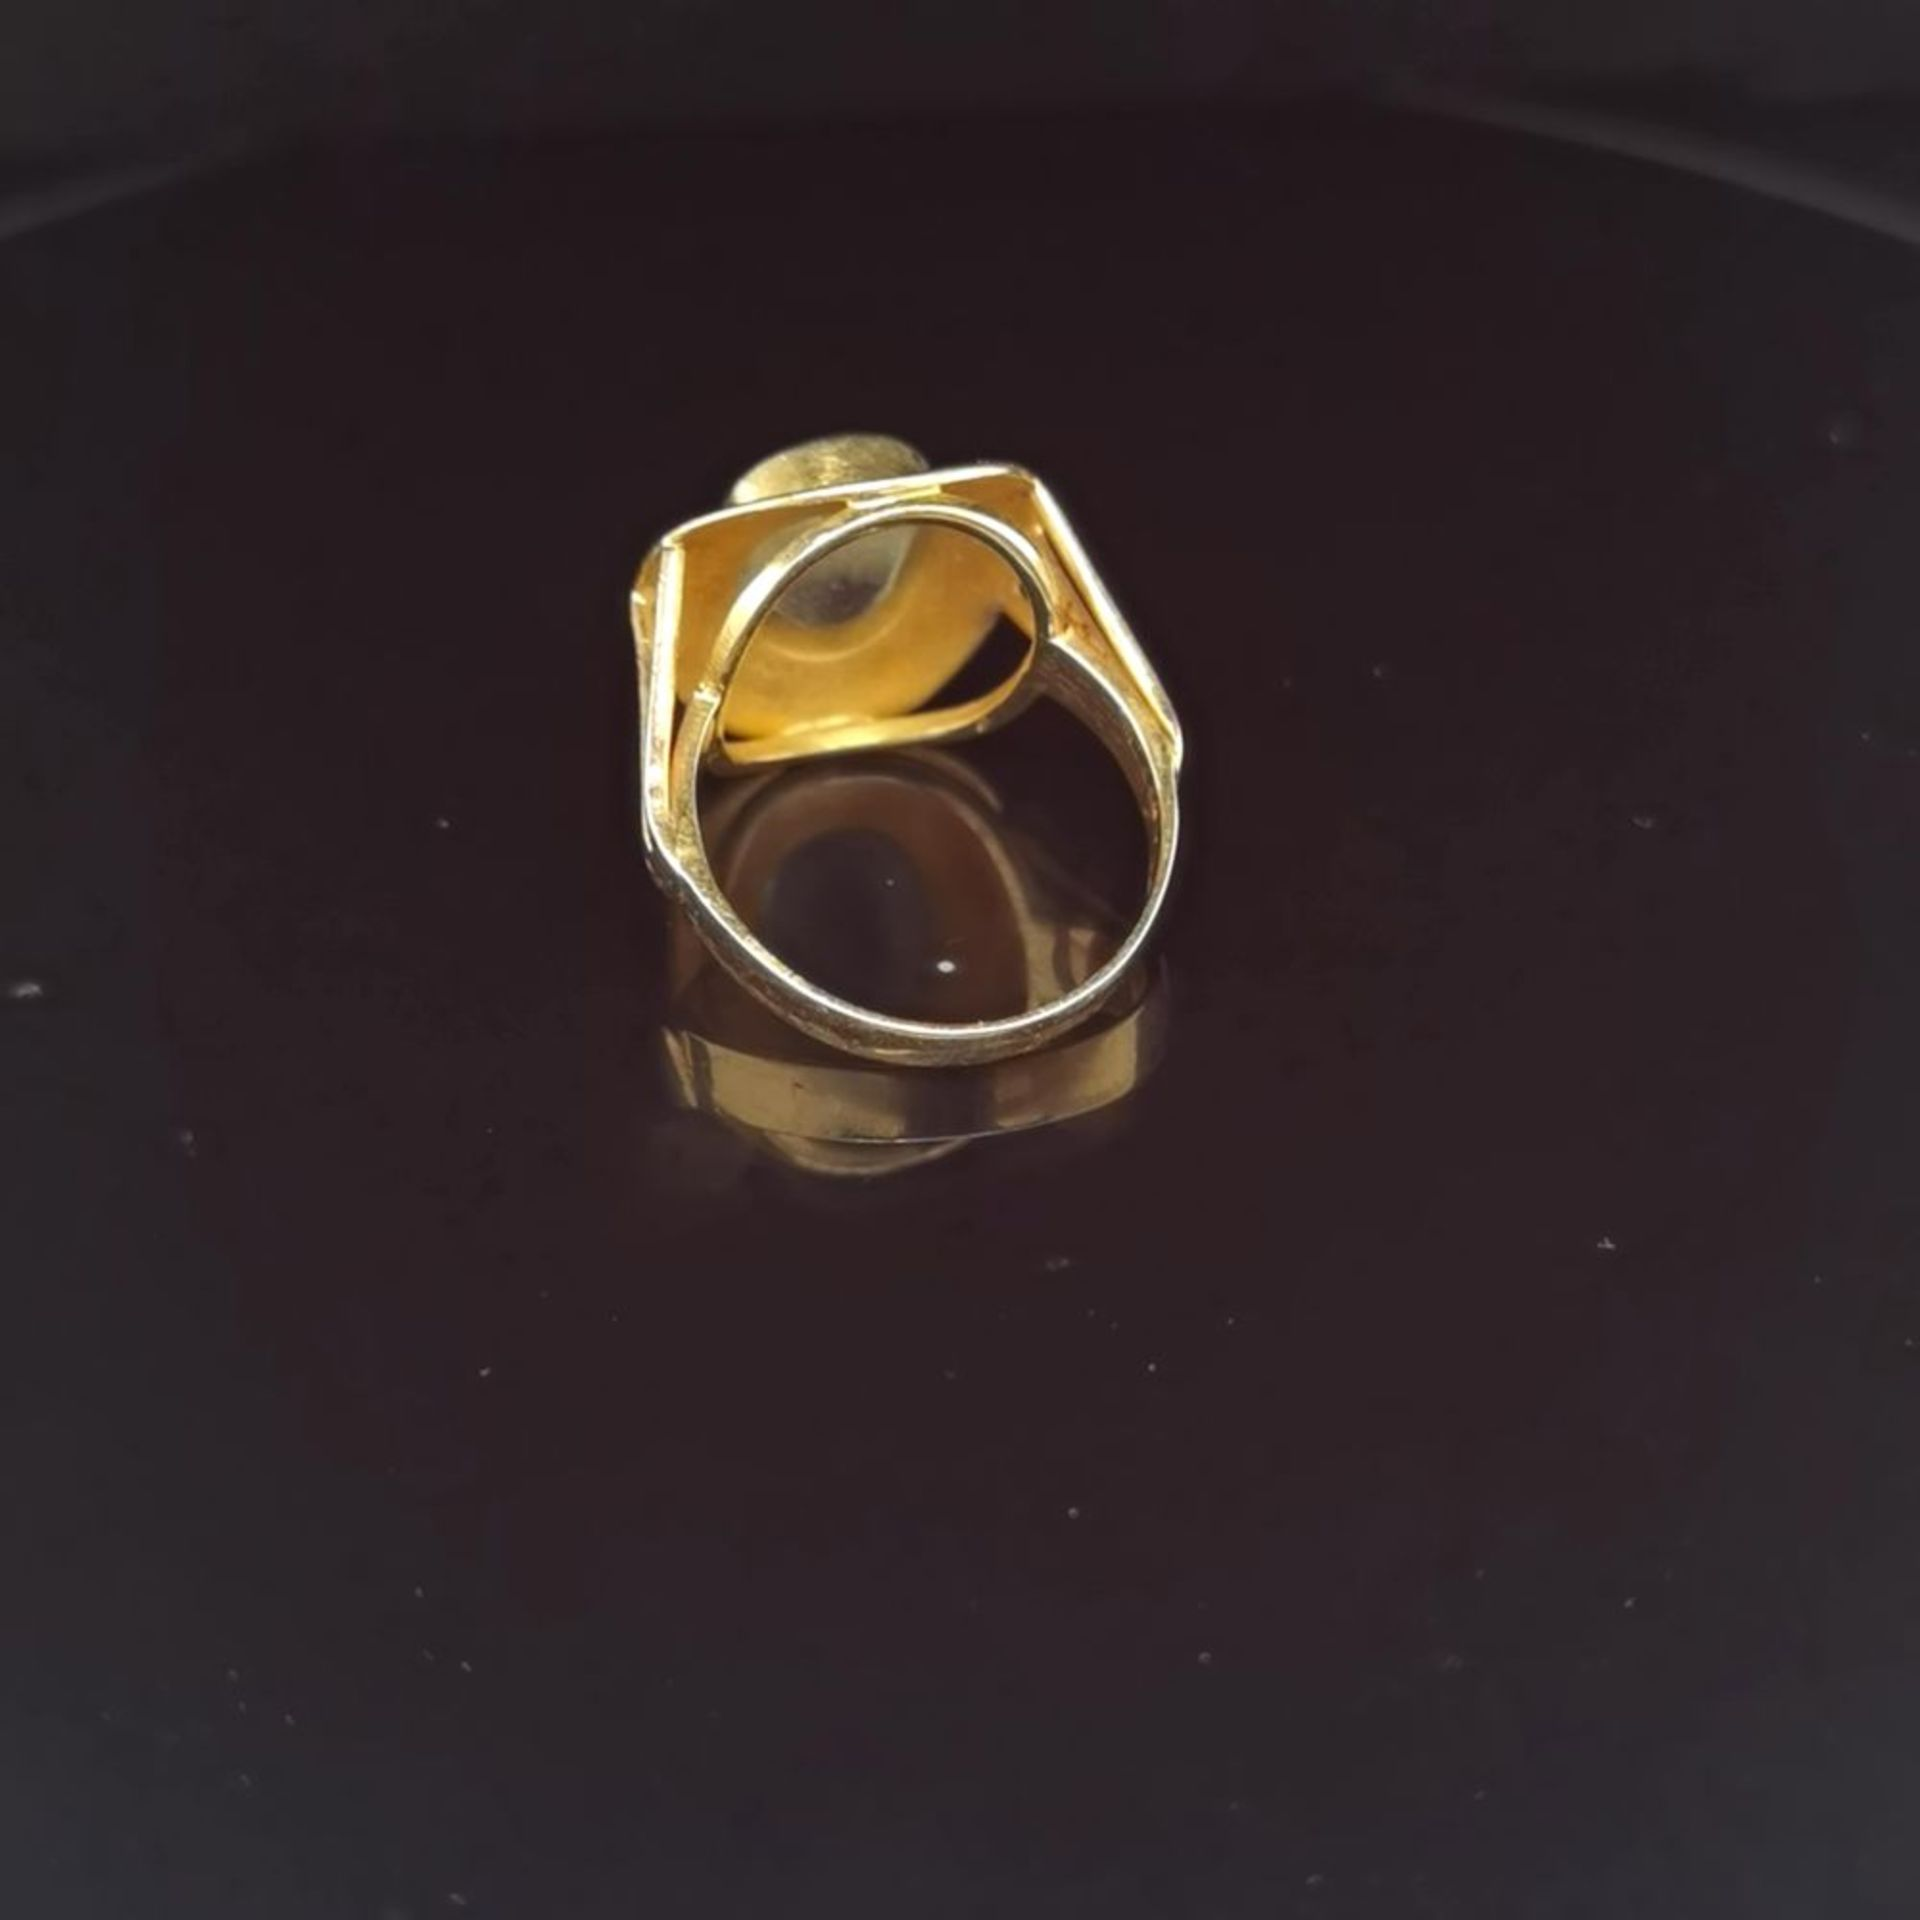 Aquamarin-Ring, 585 Gelbgold 5,7 - Image 3 of 3